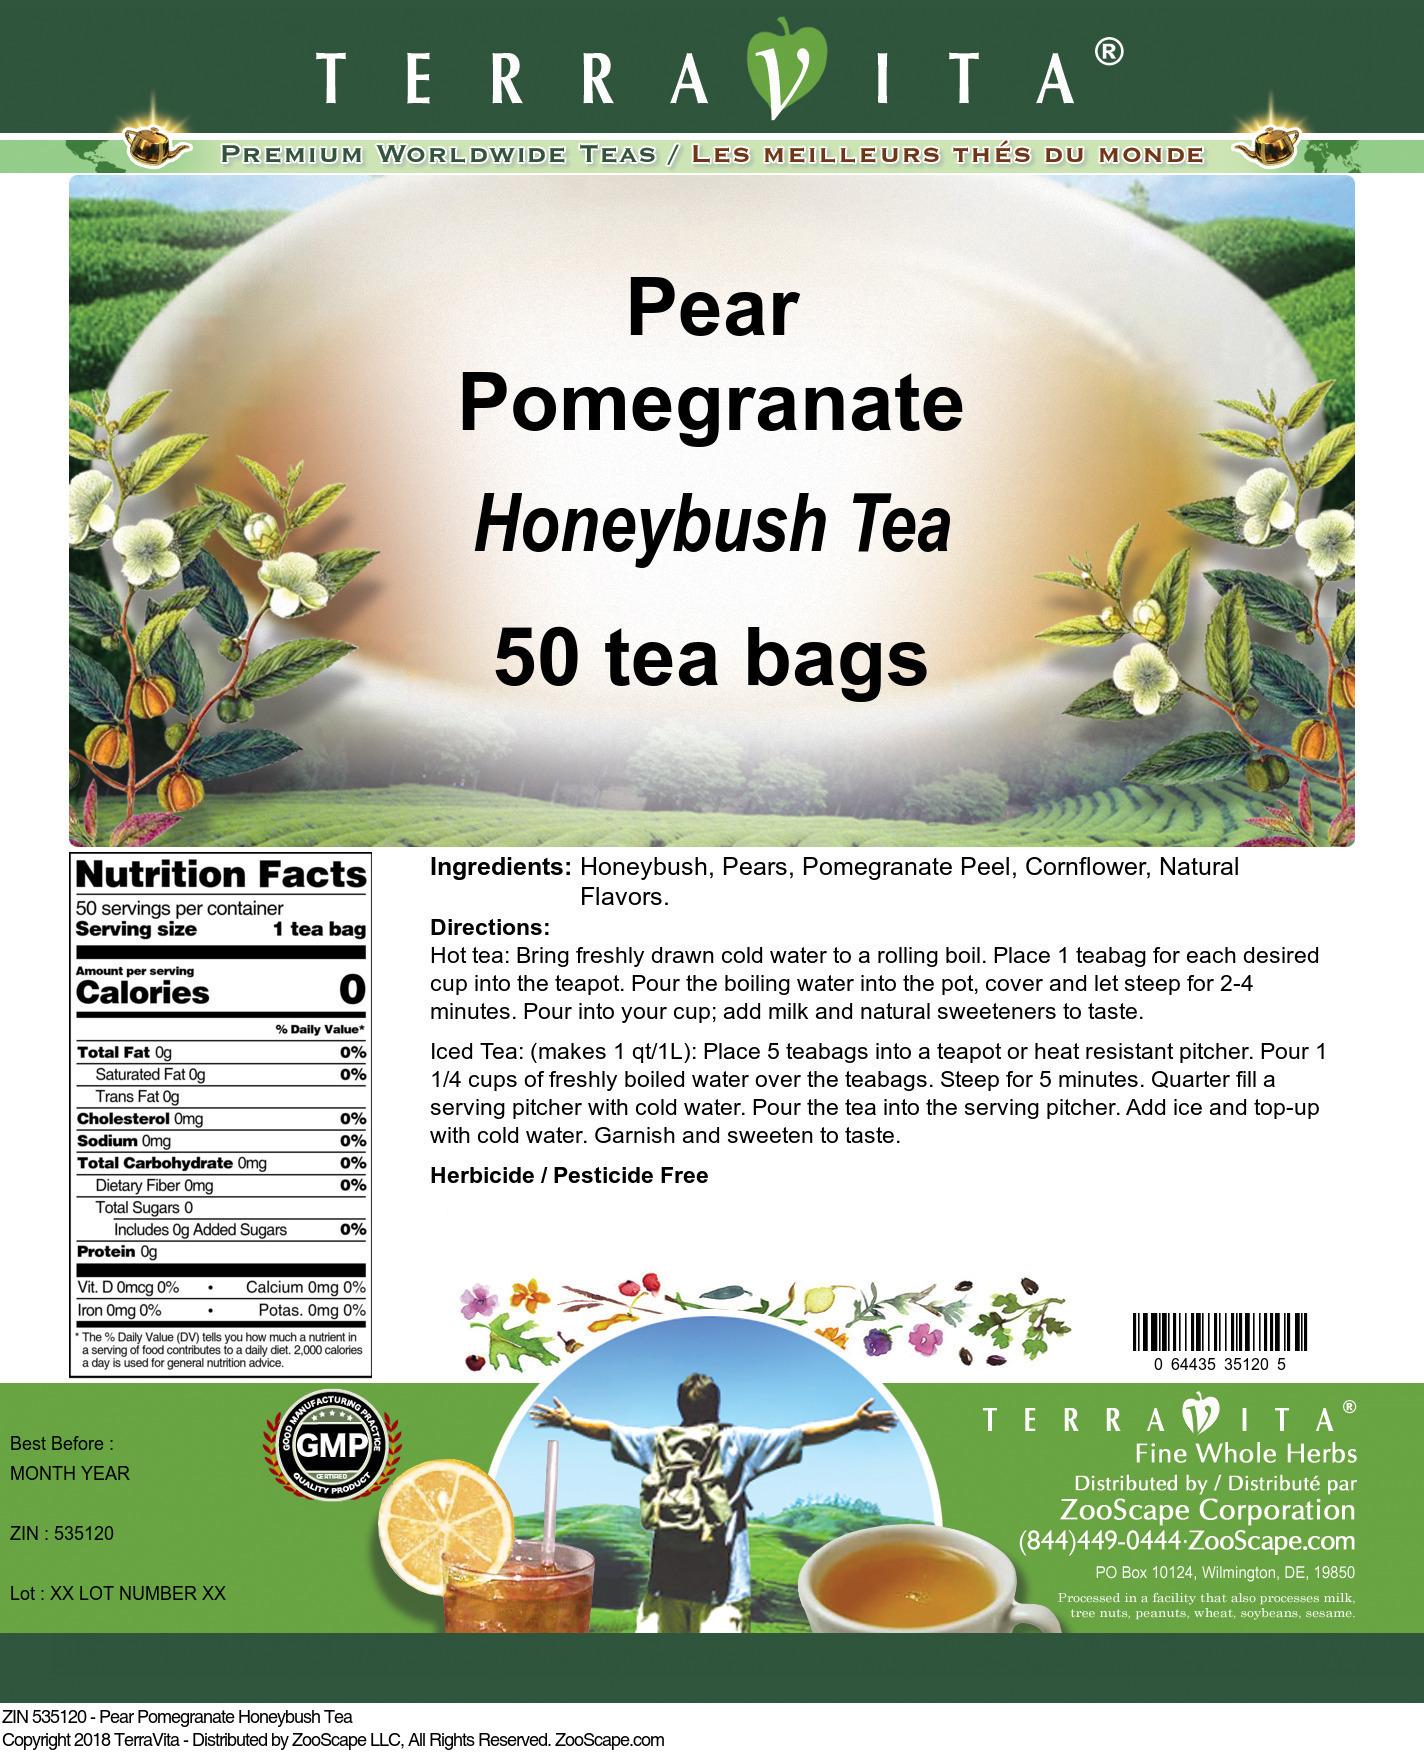 Pear Pomegranate Honeybush Tea